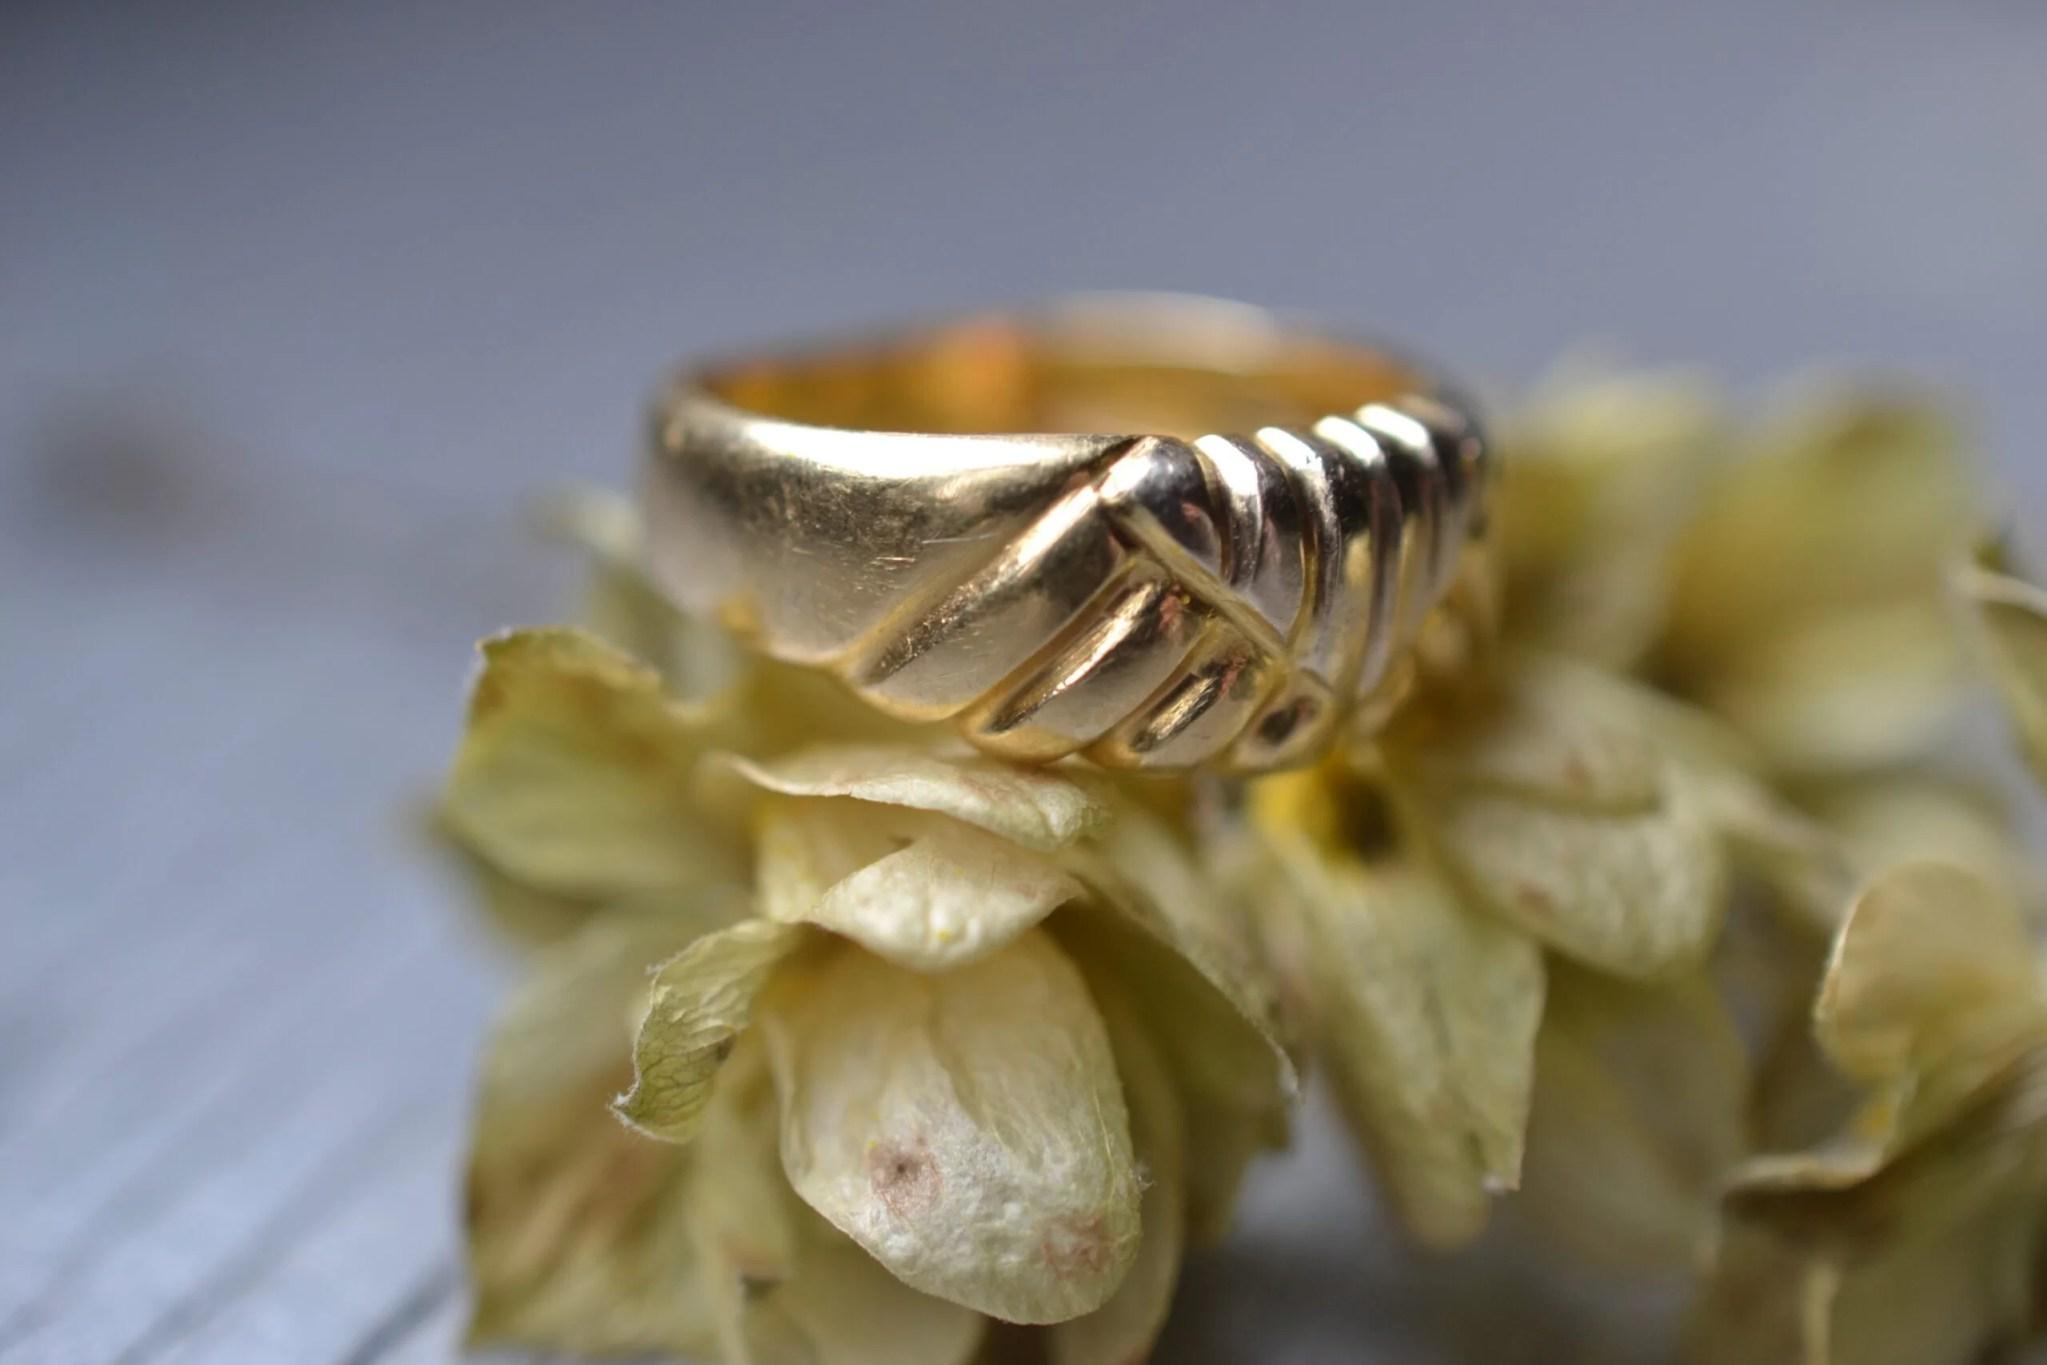 bague ancienne or massif 18 carats bijou vintage motif estampé